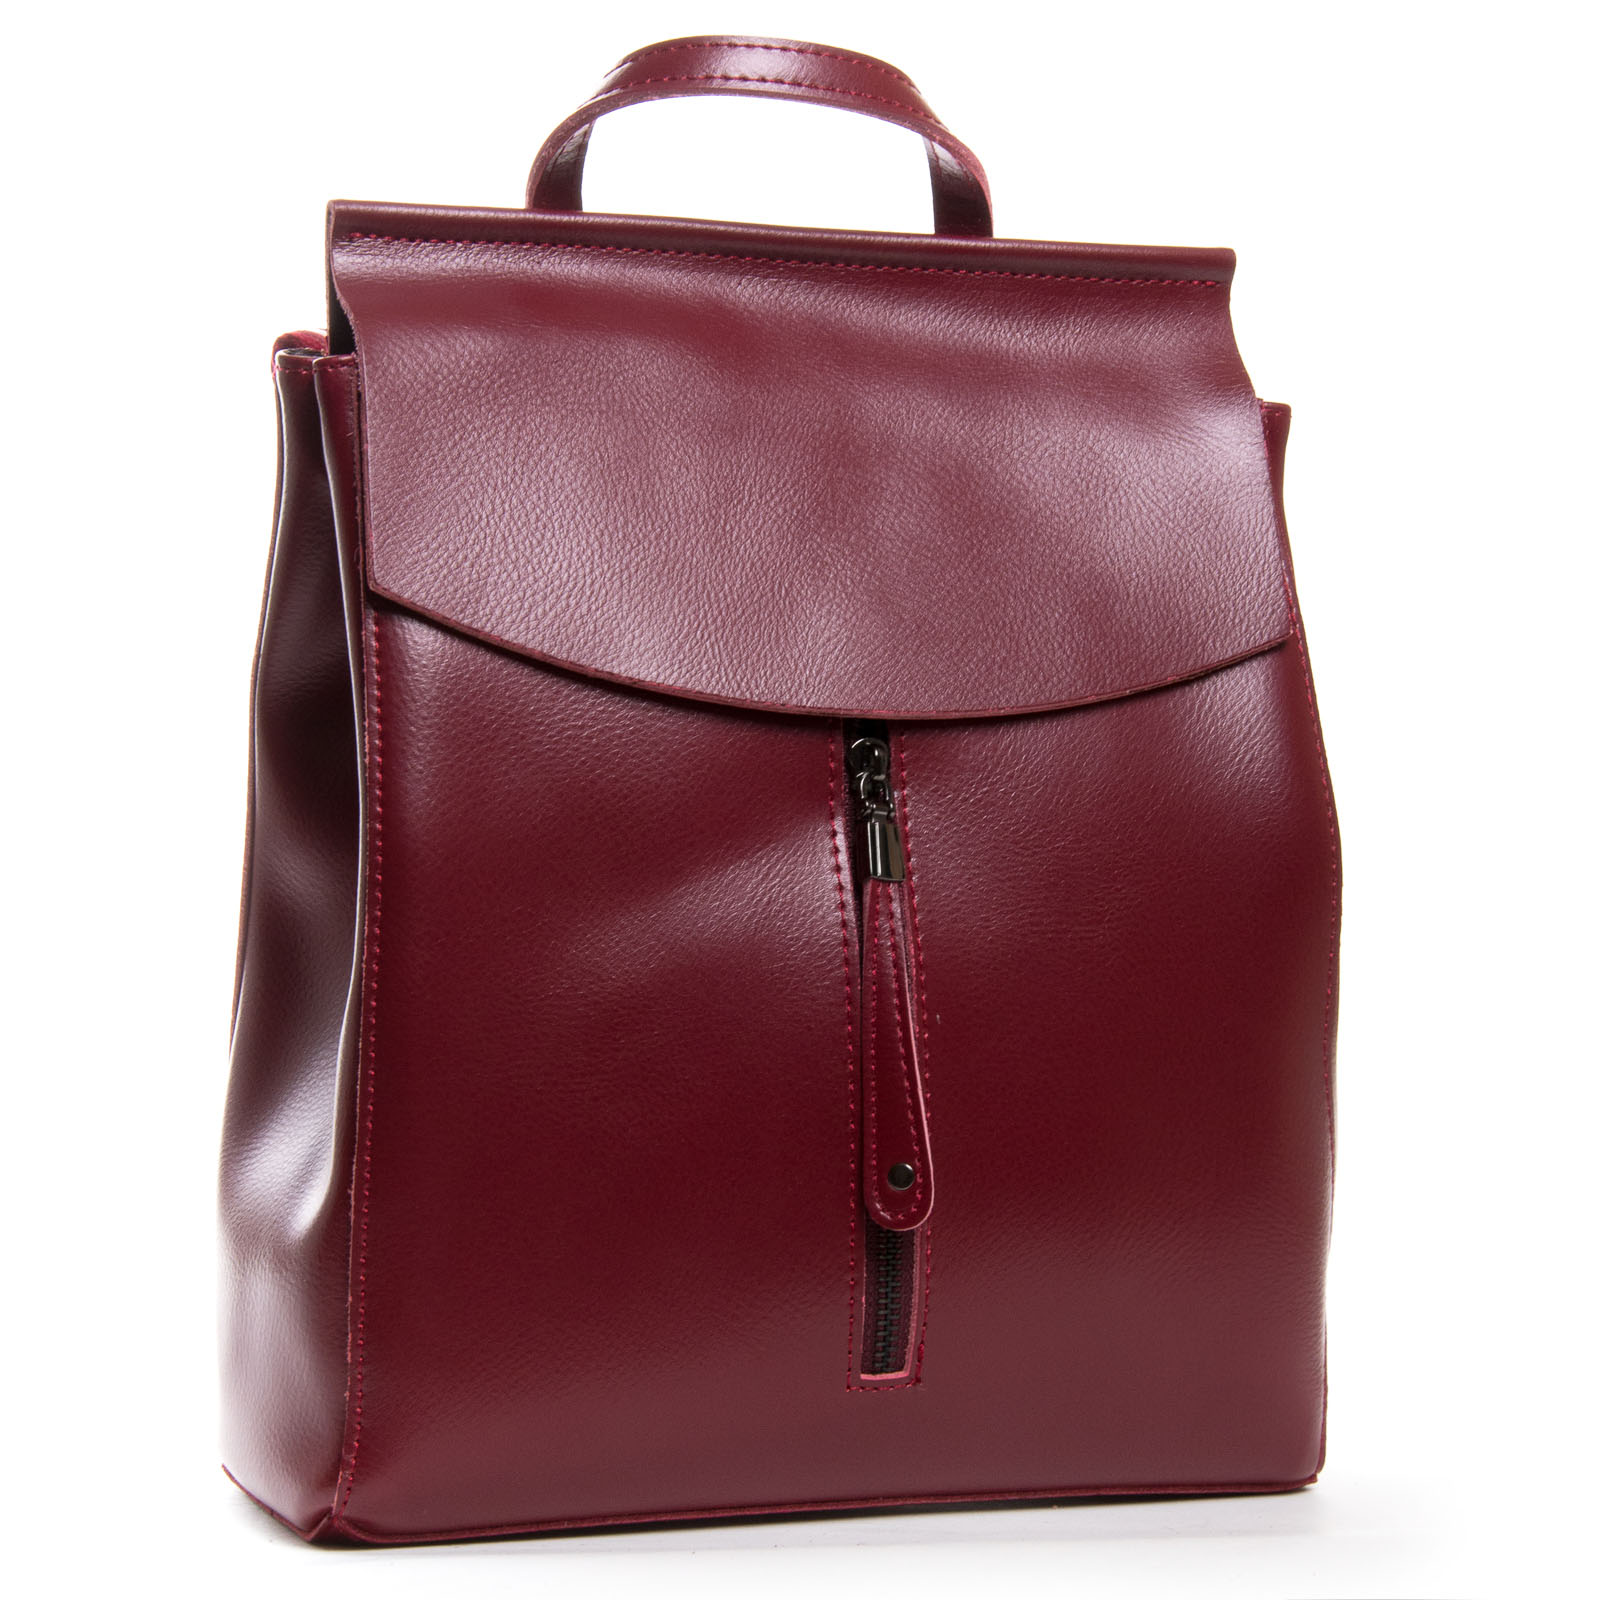 Сумка Женская Рюкзак кожа ALEX RAI 3206 l-red